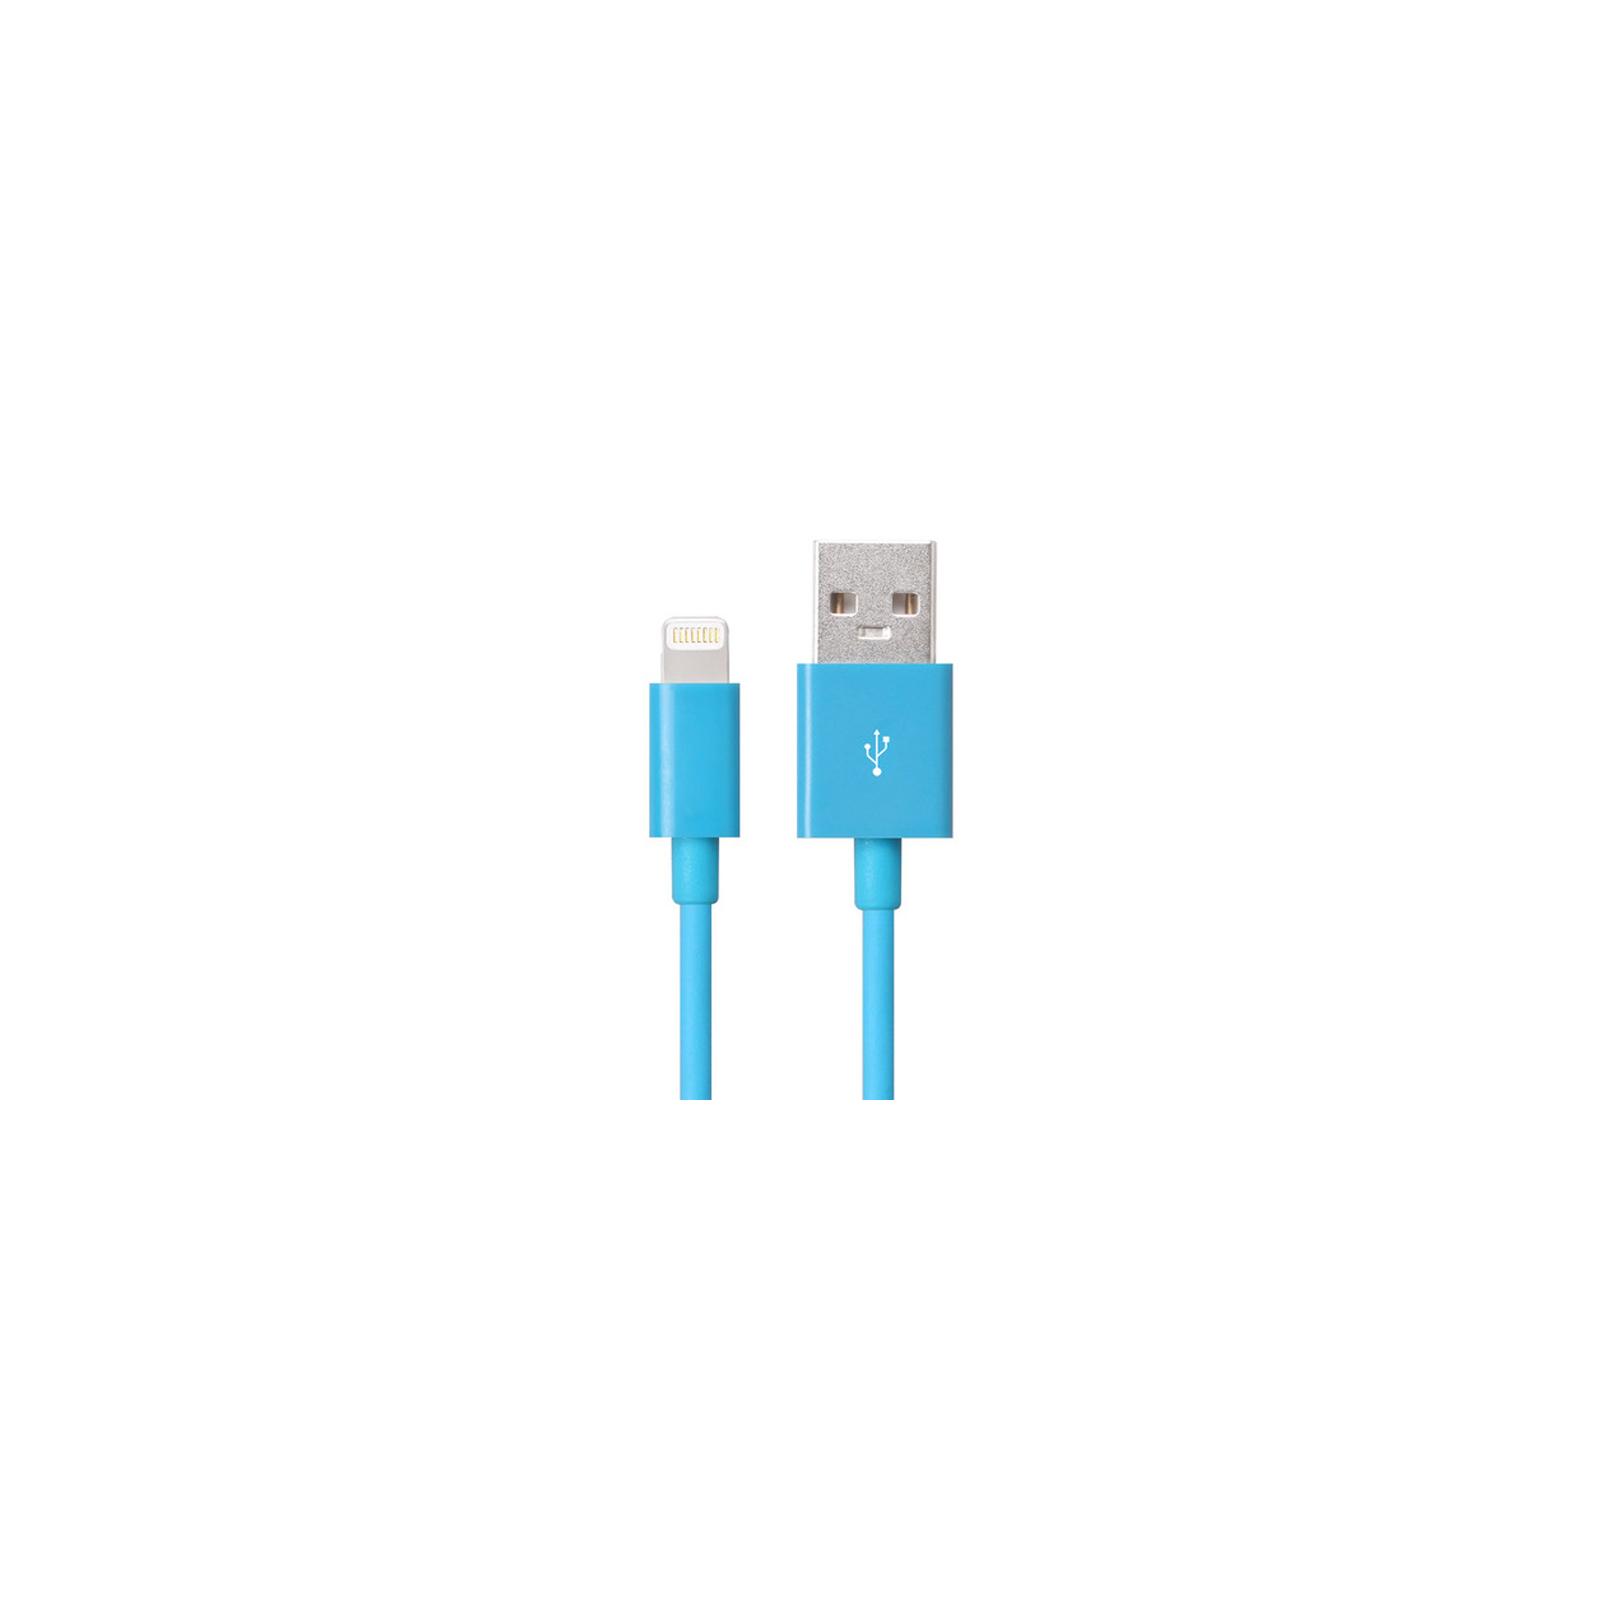 Дата кабель JUST Simple Lighting USB Cable Blue 1M (LGTNG-SMP10-BLUE)